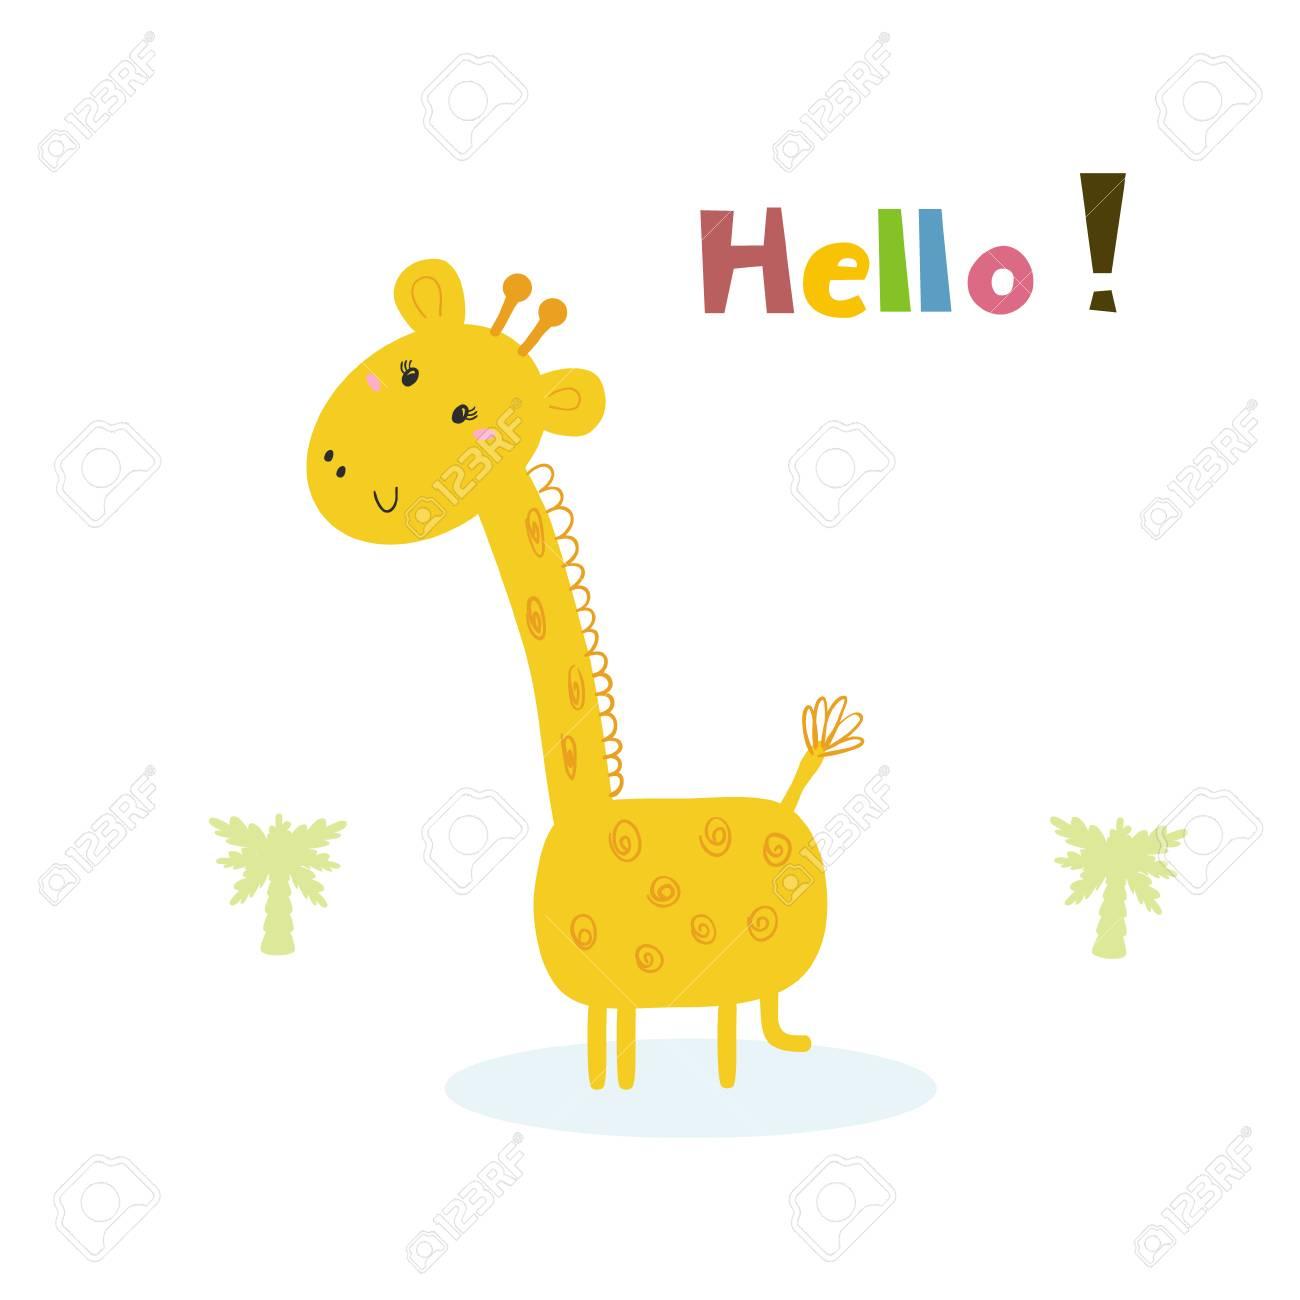 cute giraffe print for kids printable templates royalty free